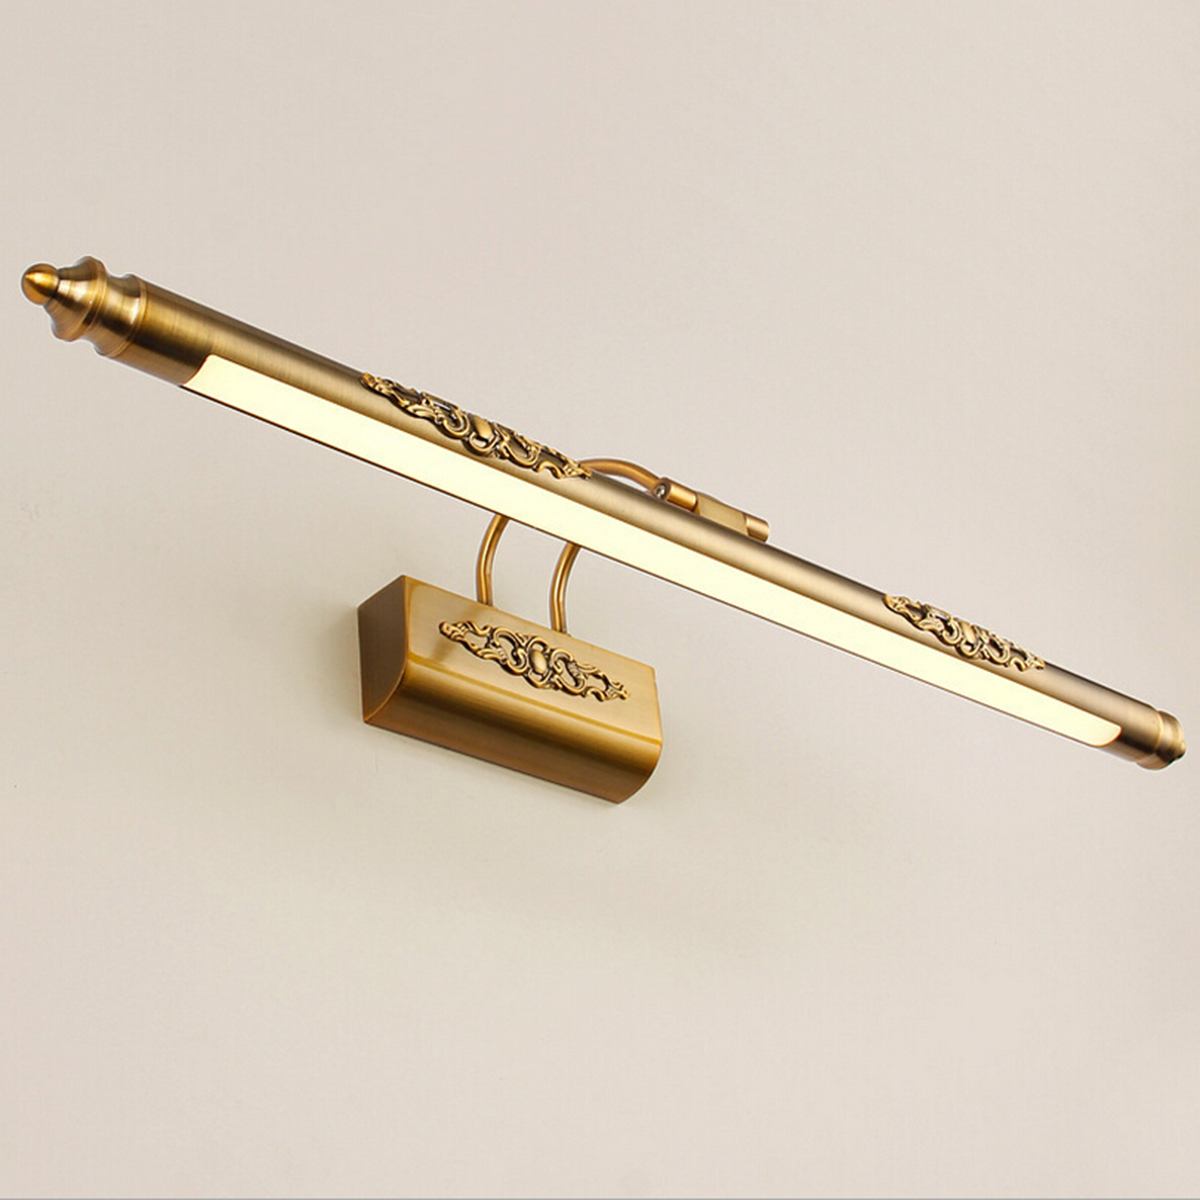 Bathroom Mirror Lamp online get cheap bathroom mirror lamp -aliexpress | alibaba group